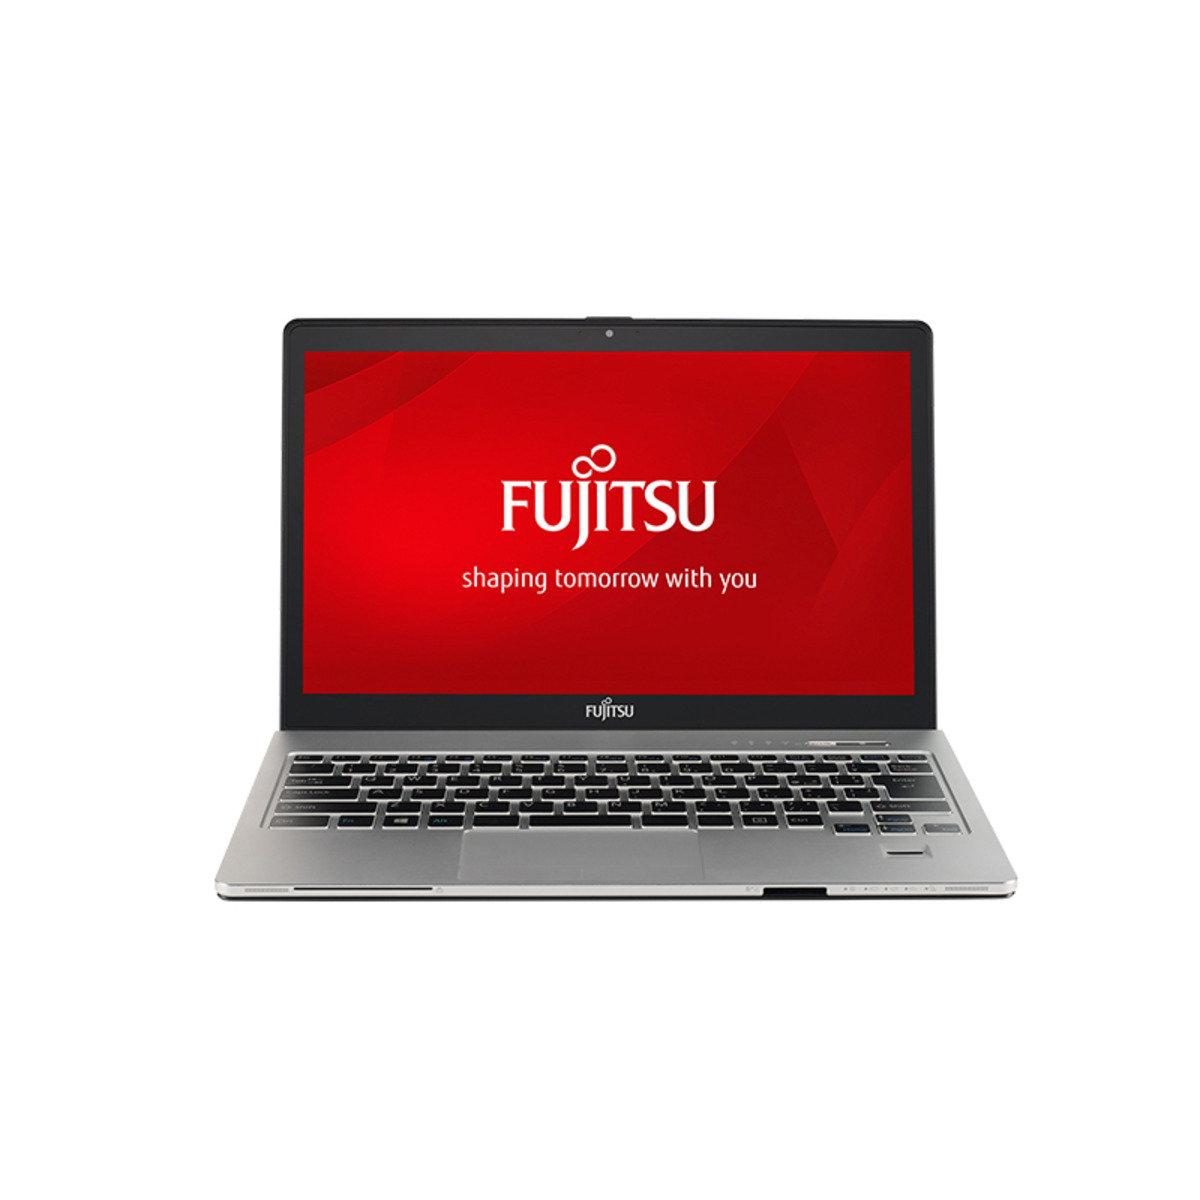 "Lifebook S904M39B 日本制造 Core  i5 / 13.3"" FHD / 3 Year's Warranty"